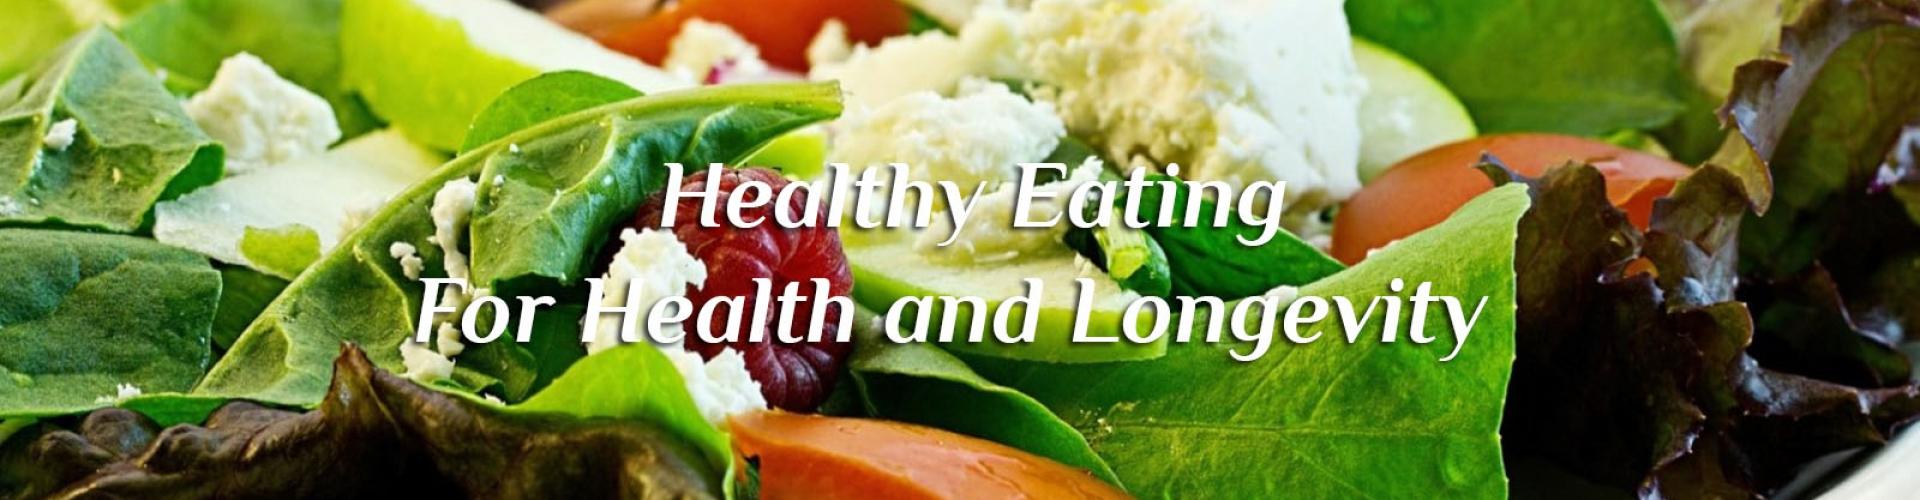 Clean-Eating-Health-1920x500_c